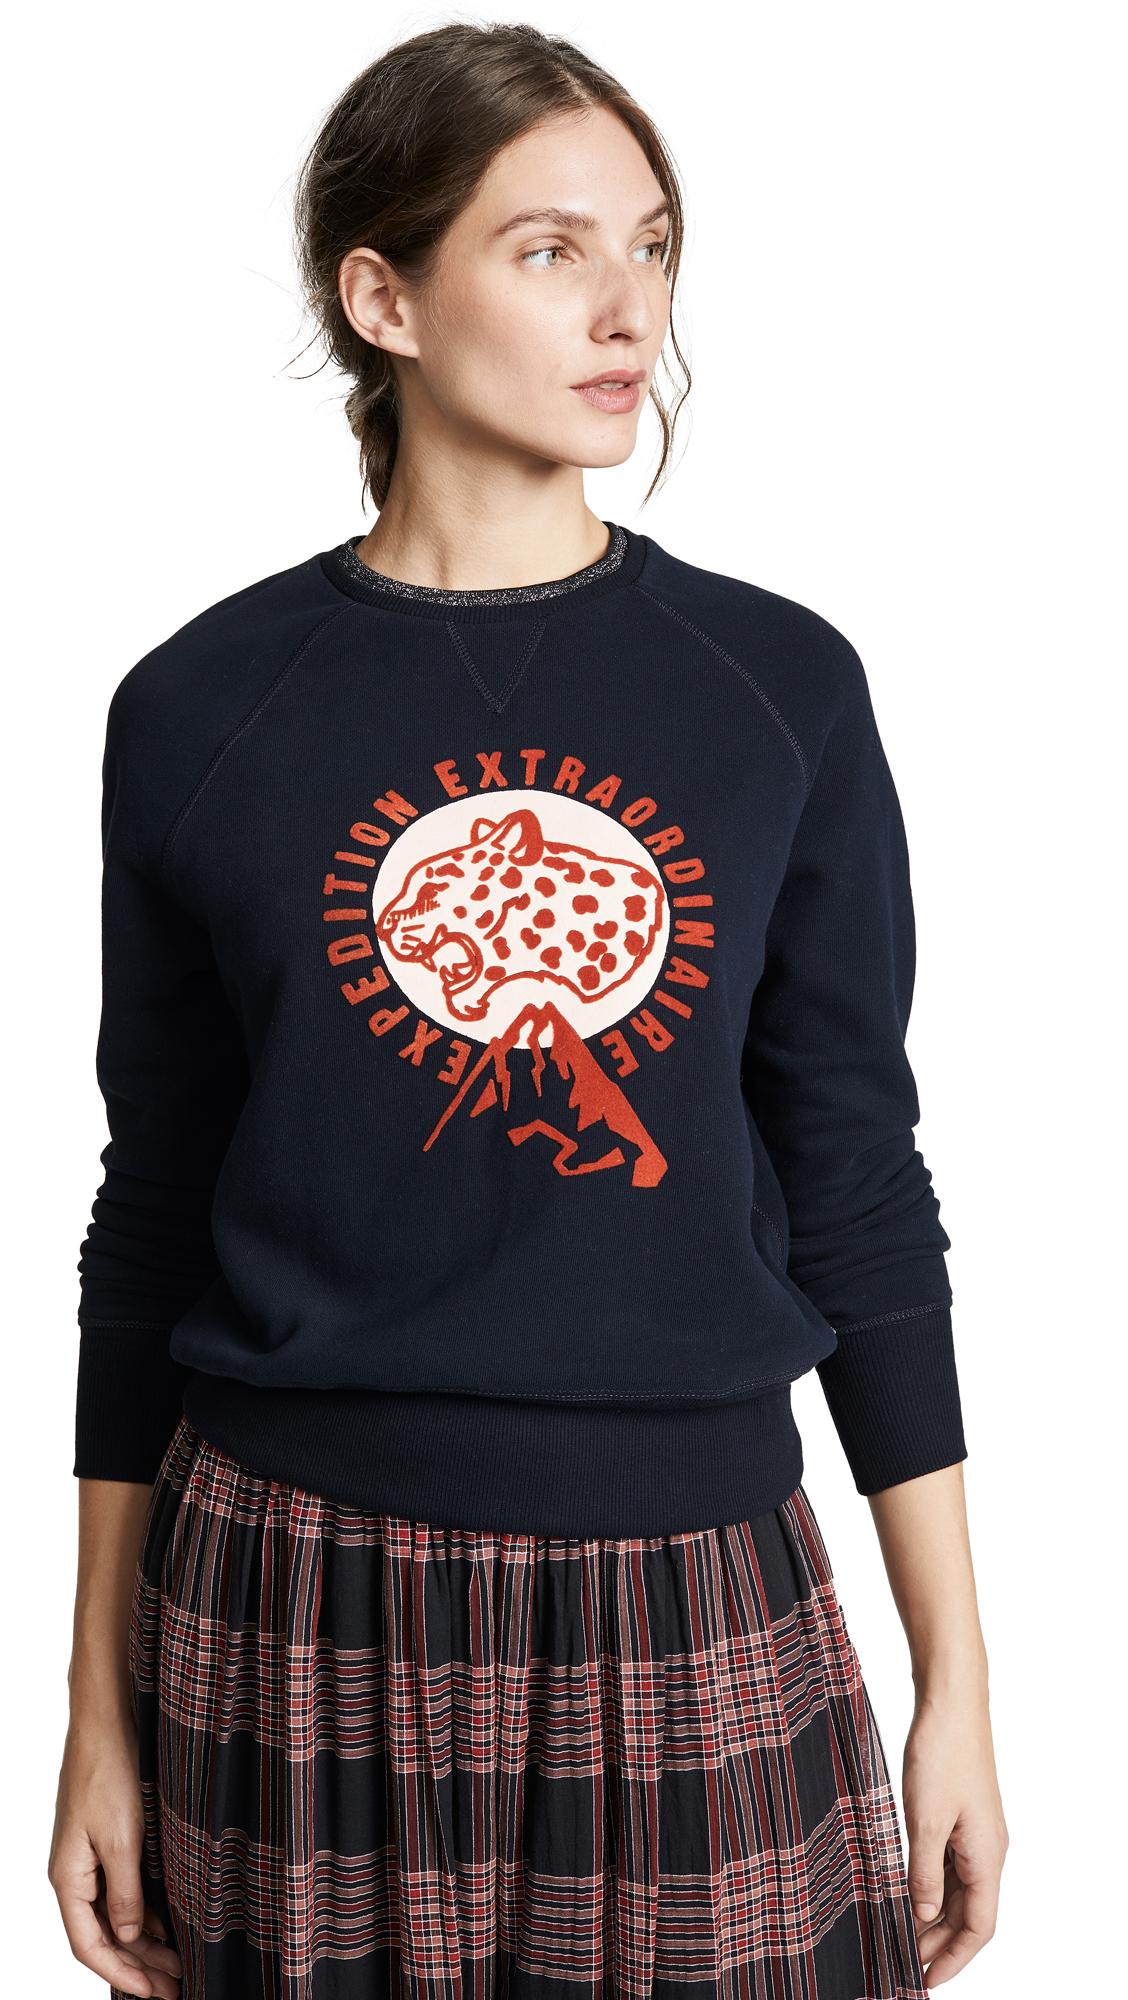 SCOTCH & SODA/MAISON SCOTCH Raglan Tiger Sweater in Night